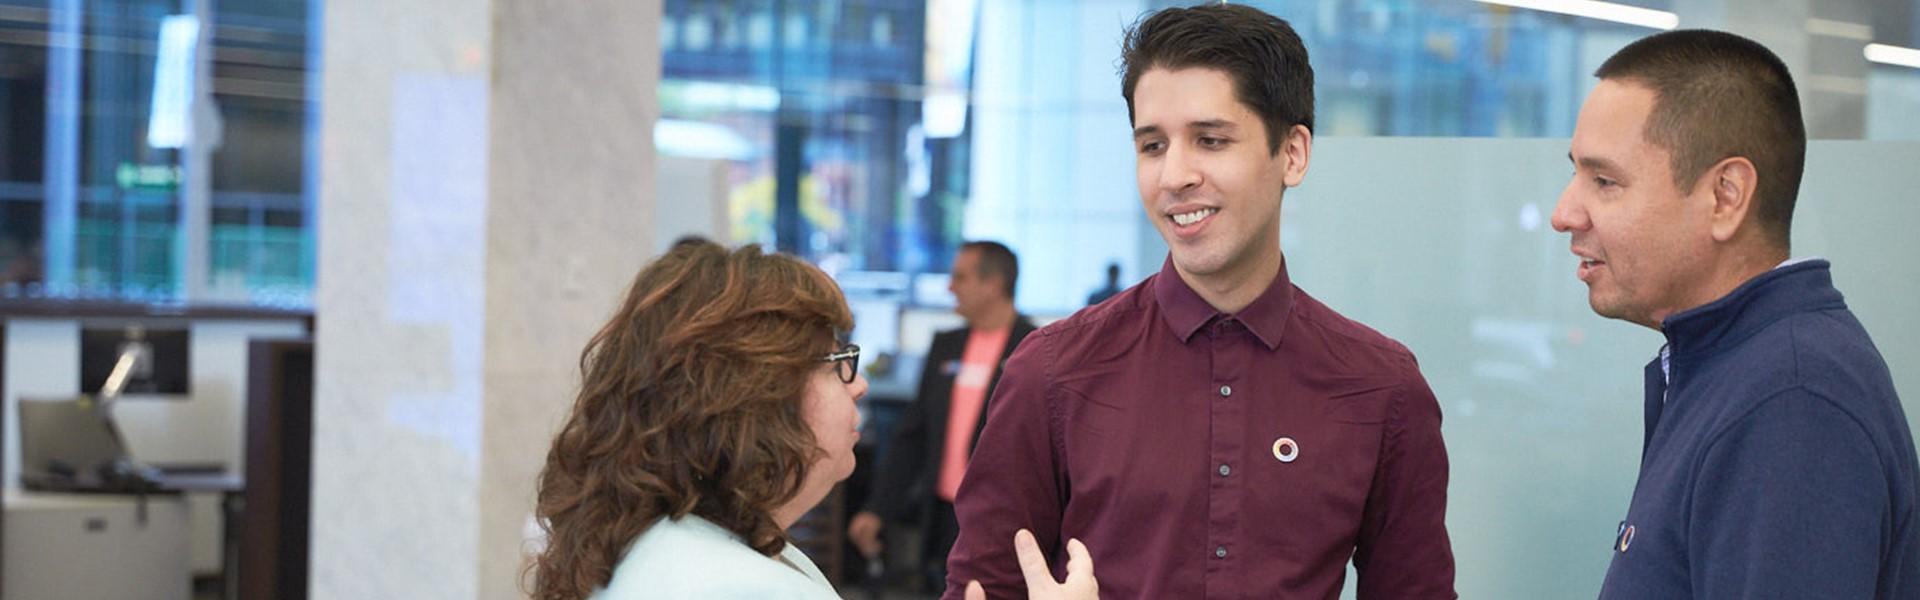 Three employees having a standing conversation.